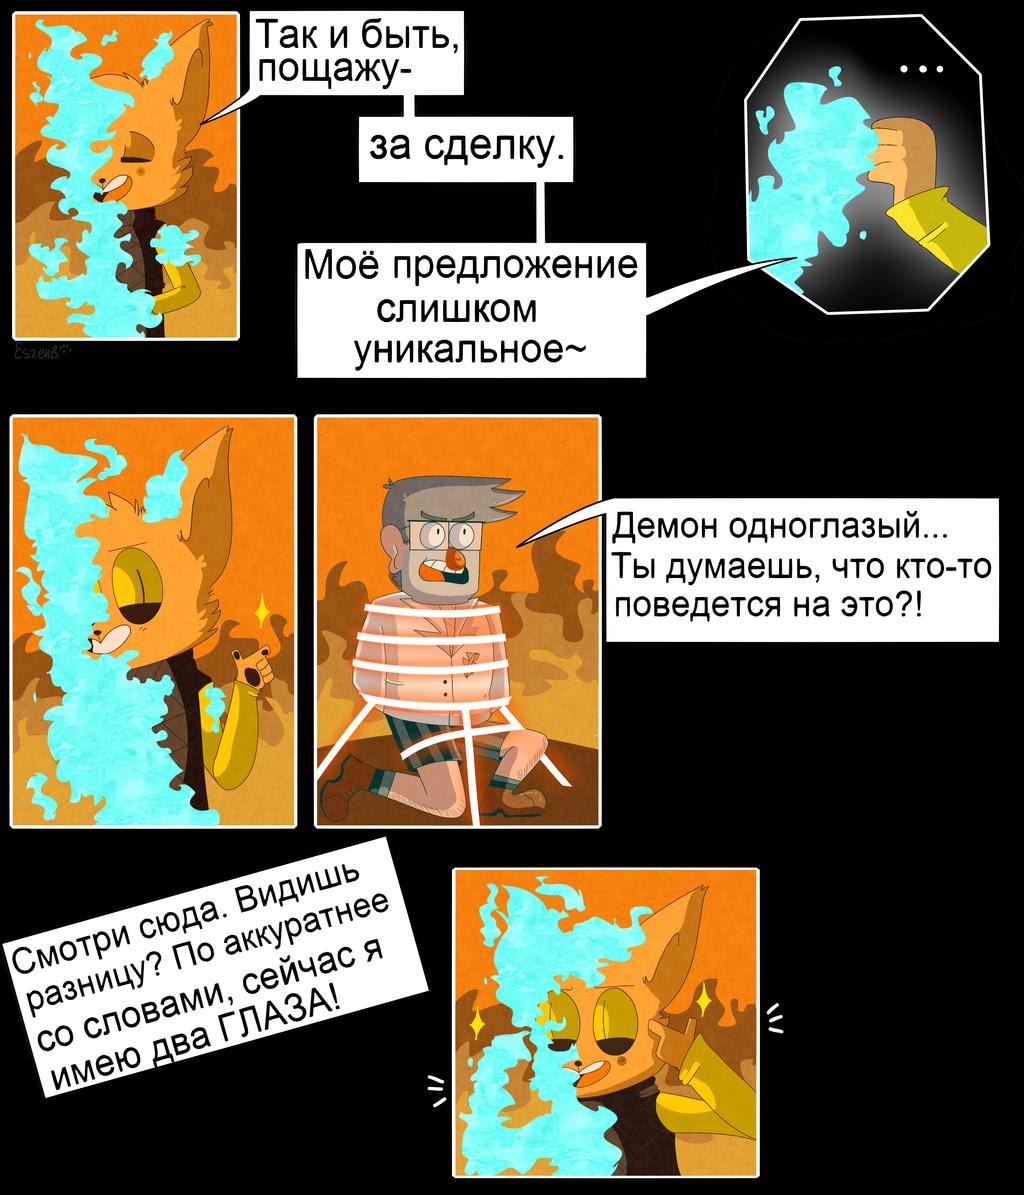 DSTDIH|prologue|page 11 by EszettB